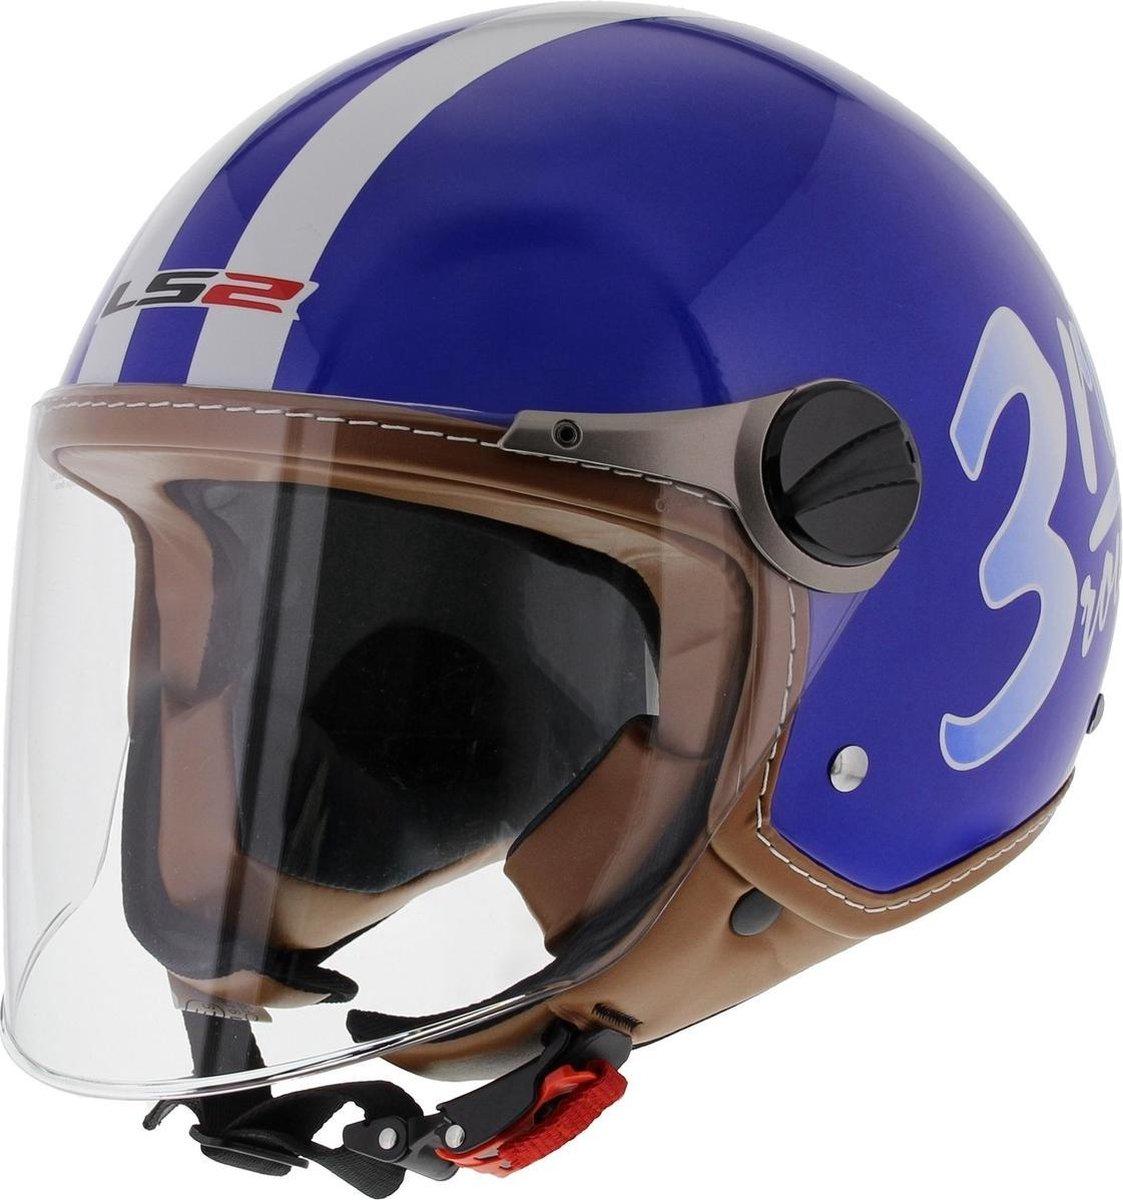 LS2 OF560 Round Jethelm - Motorhelm - Glans Blauw - Maat M